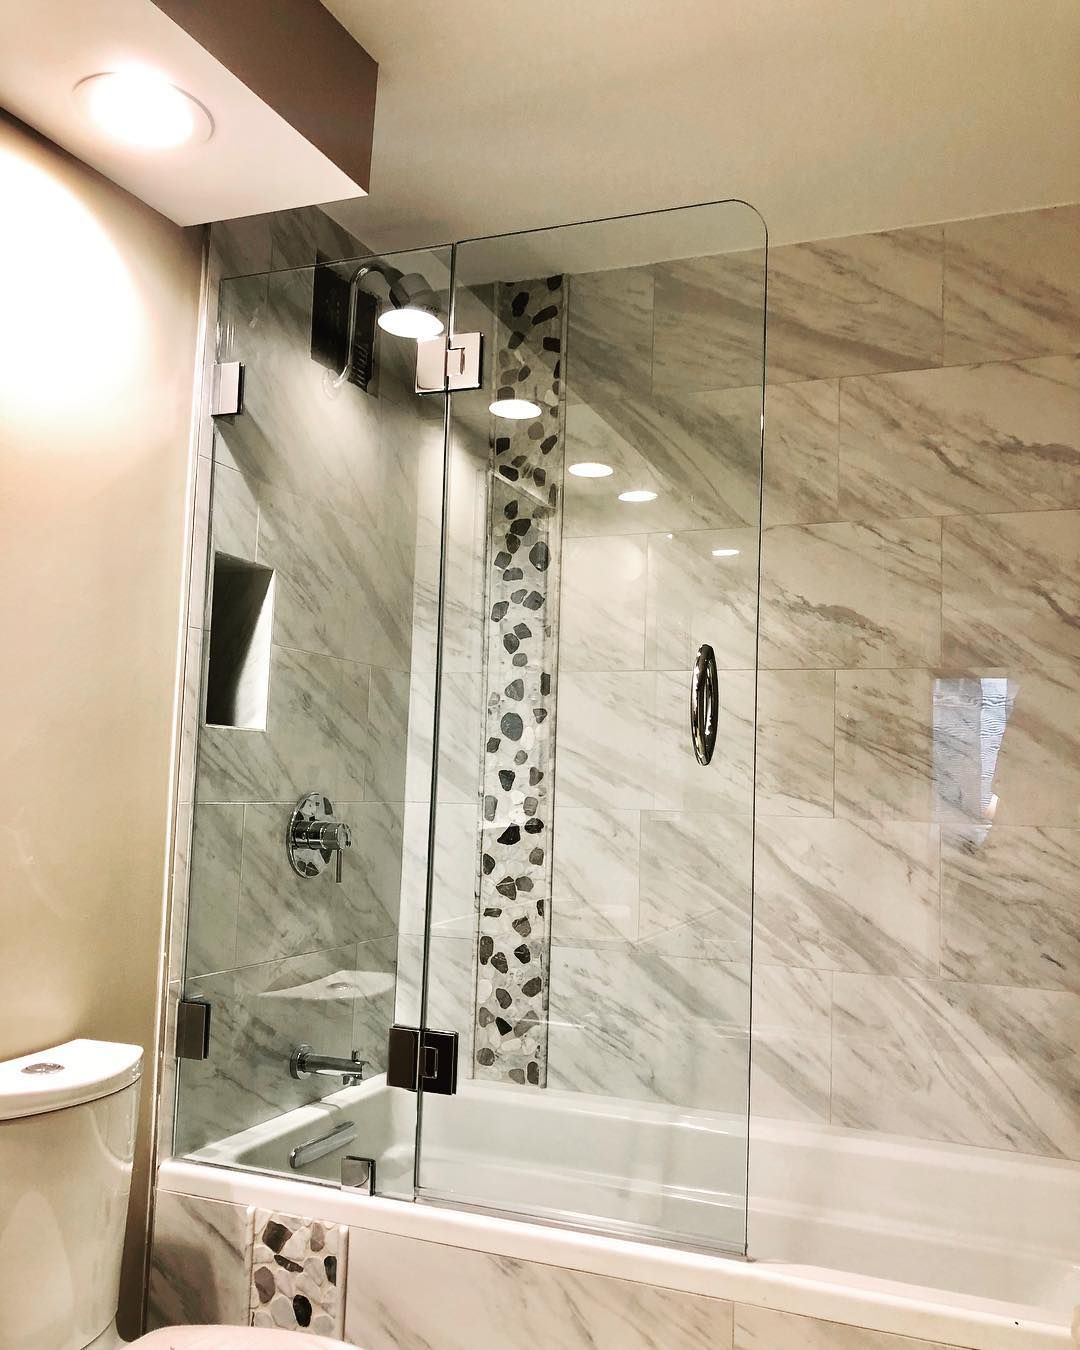 Exclusive Design Custom Frameless Tub Body Splash Guard Panels